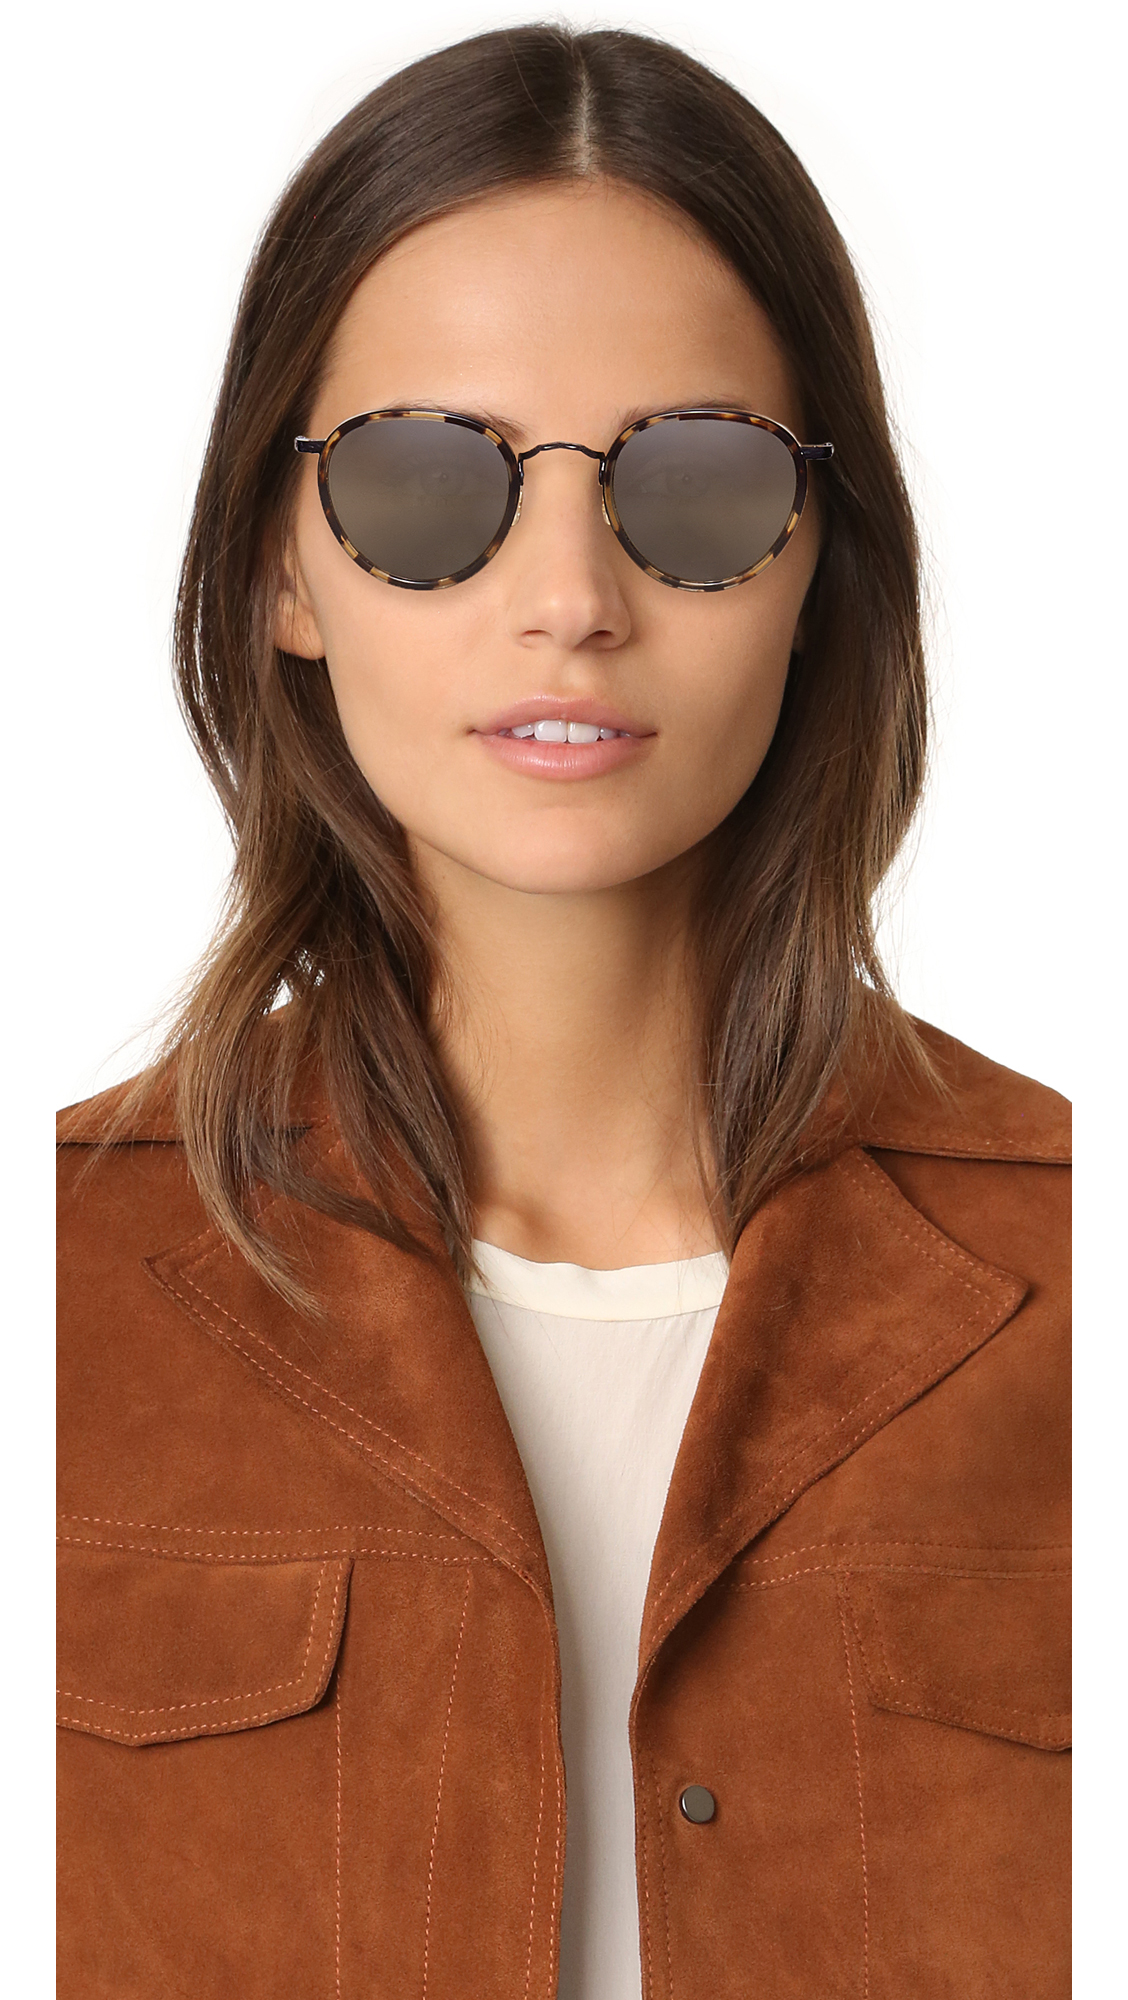 7a8e61ddec2 Oliver Peoples Eyewear MP-2 Sunglasses